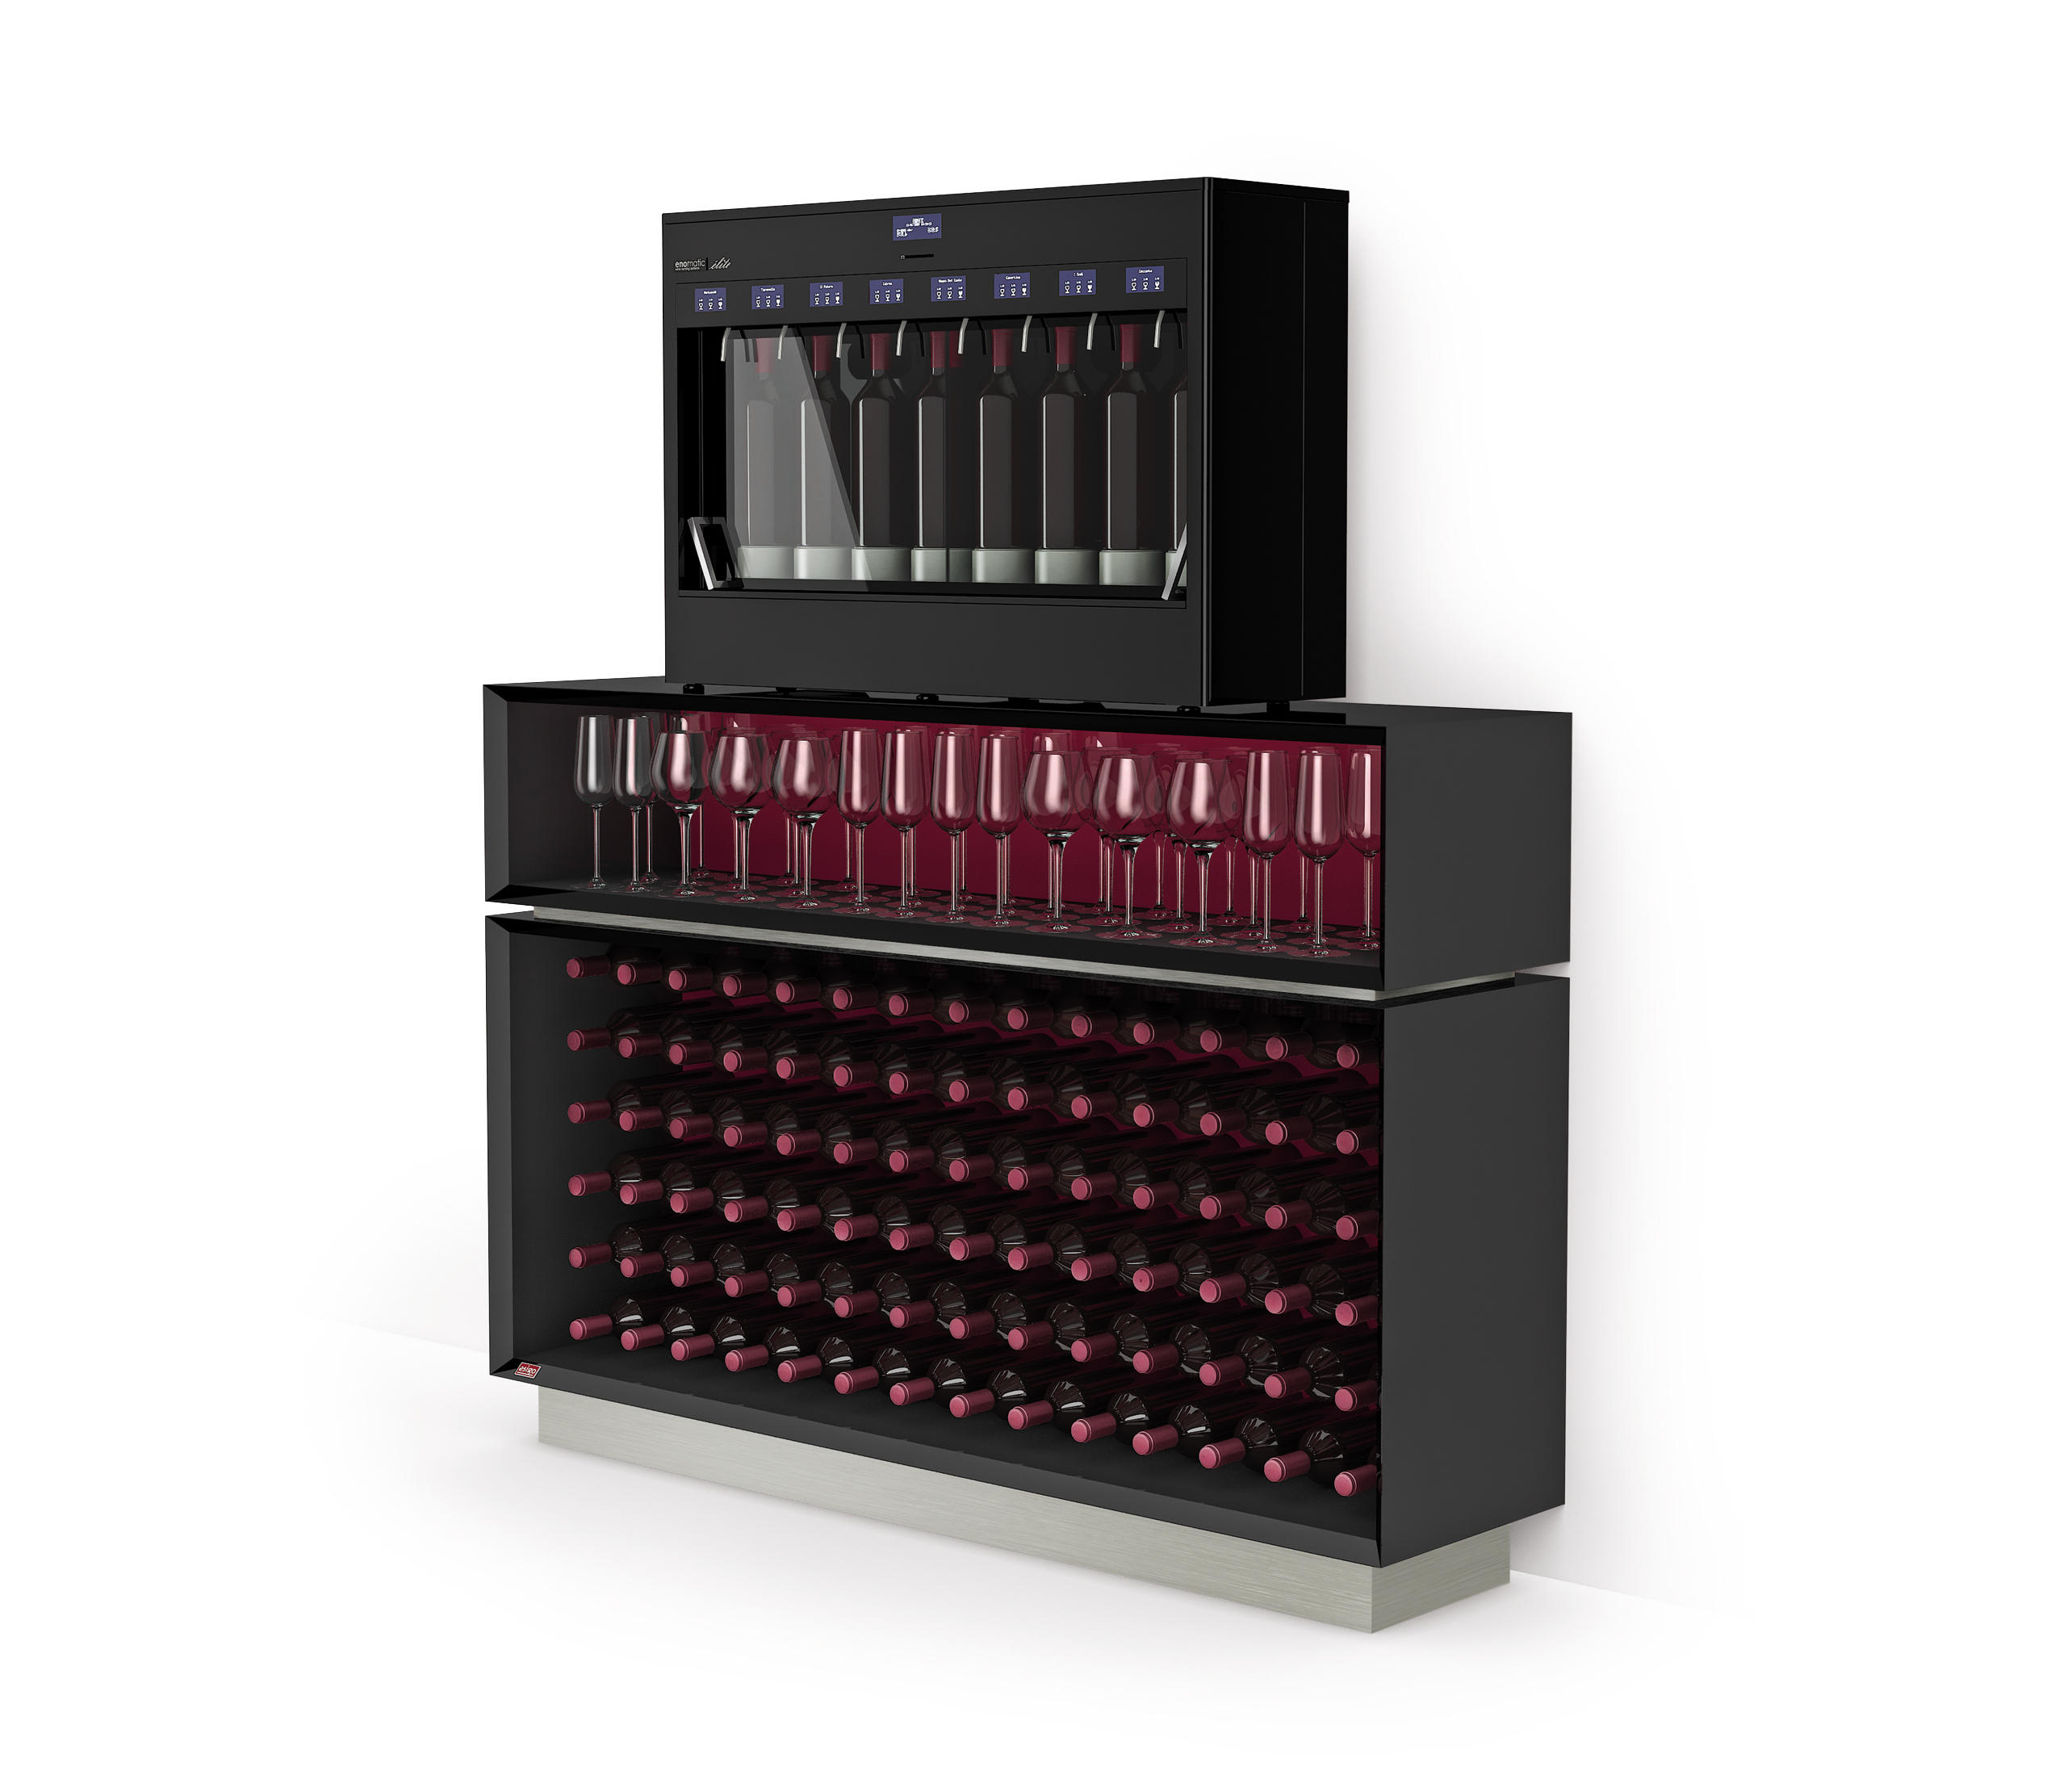 Kitchen Cabinet Manufacturers List Esigo Wss4 Wine Rack Cabinet Wine Racks From Esigo